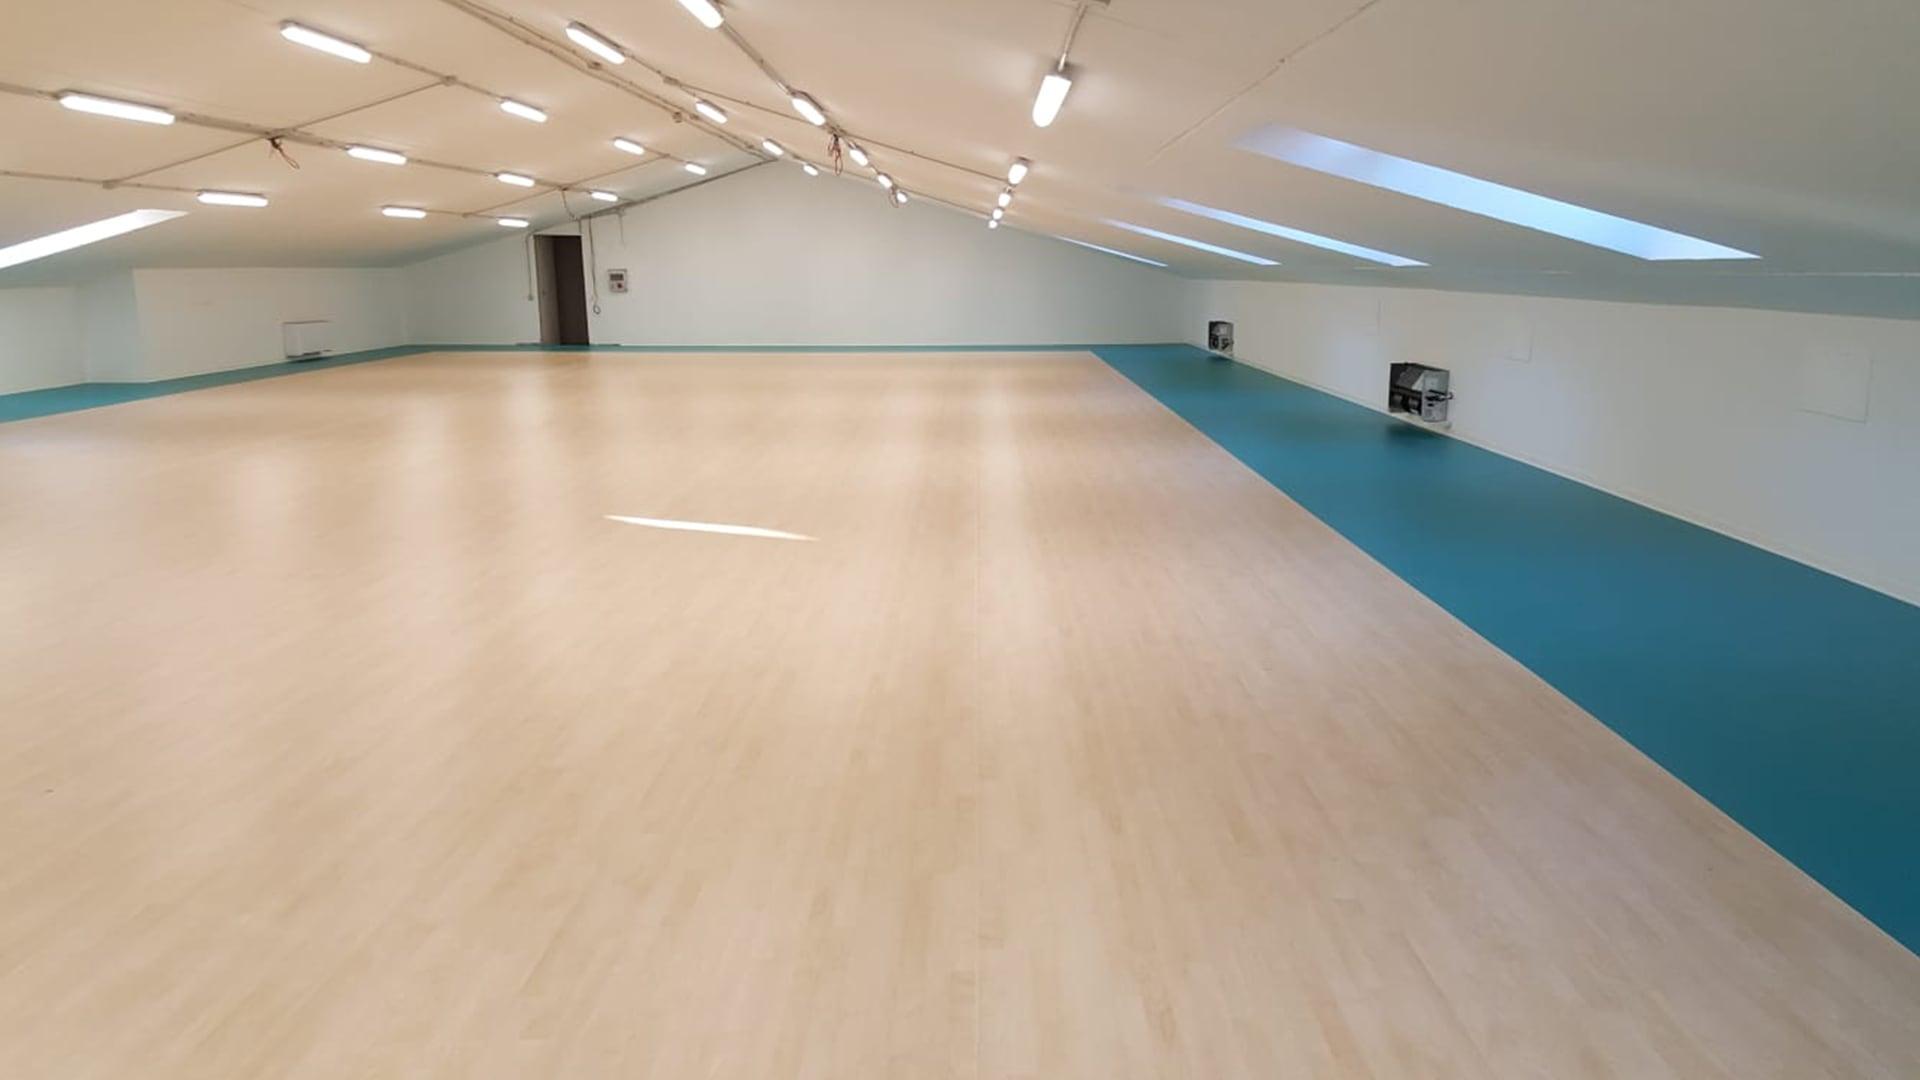 pavimento-sportivo-palestra-tarkett_4